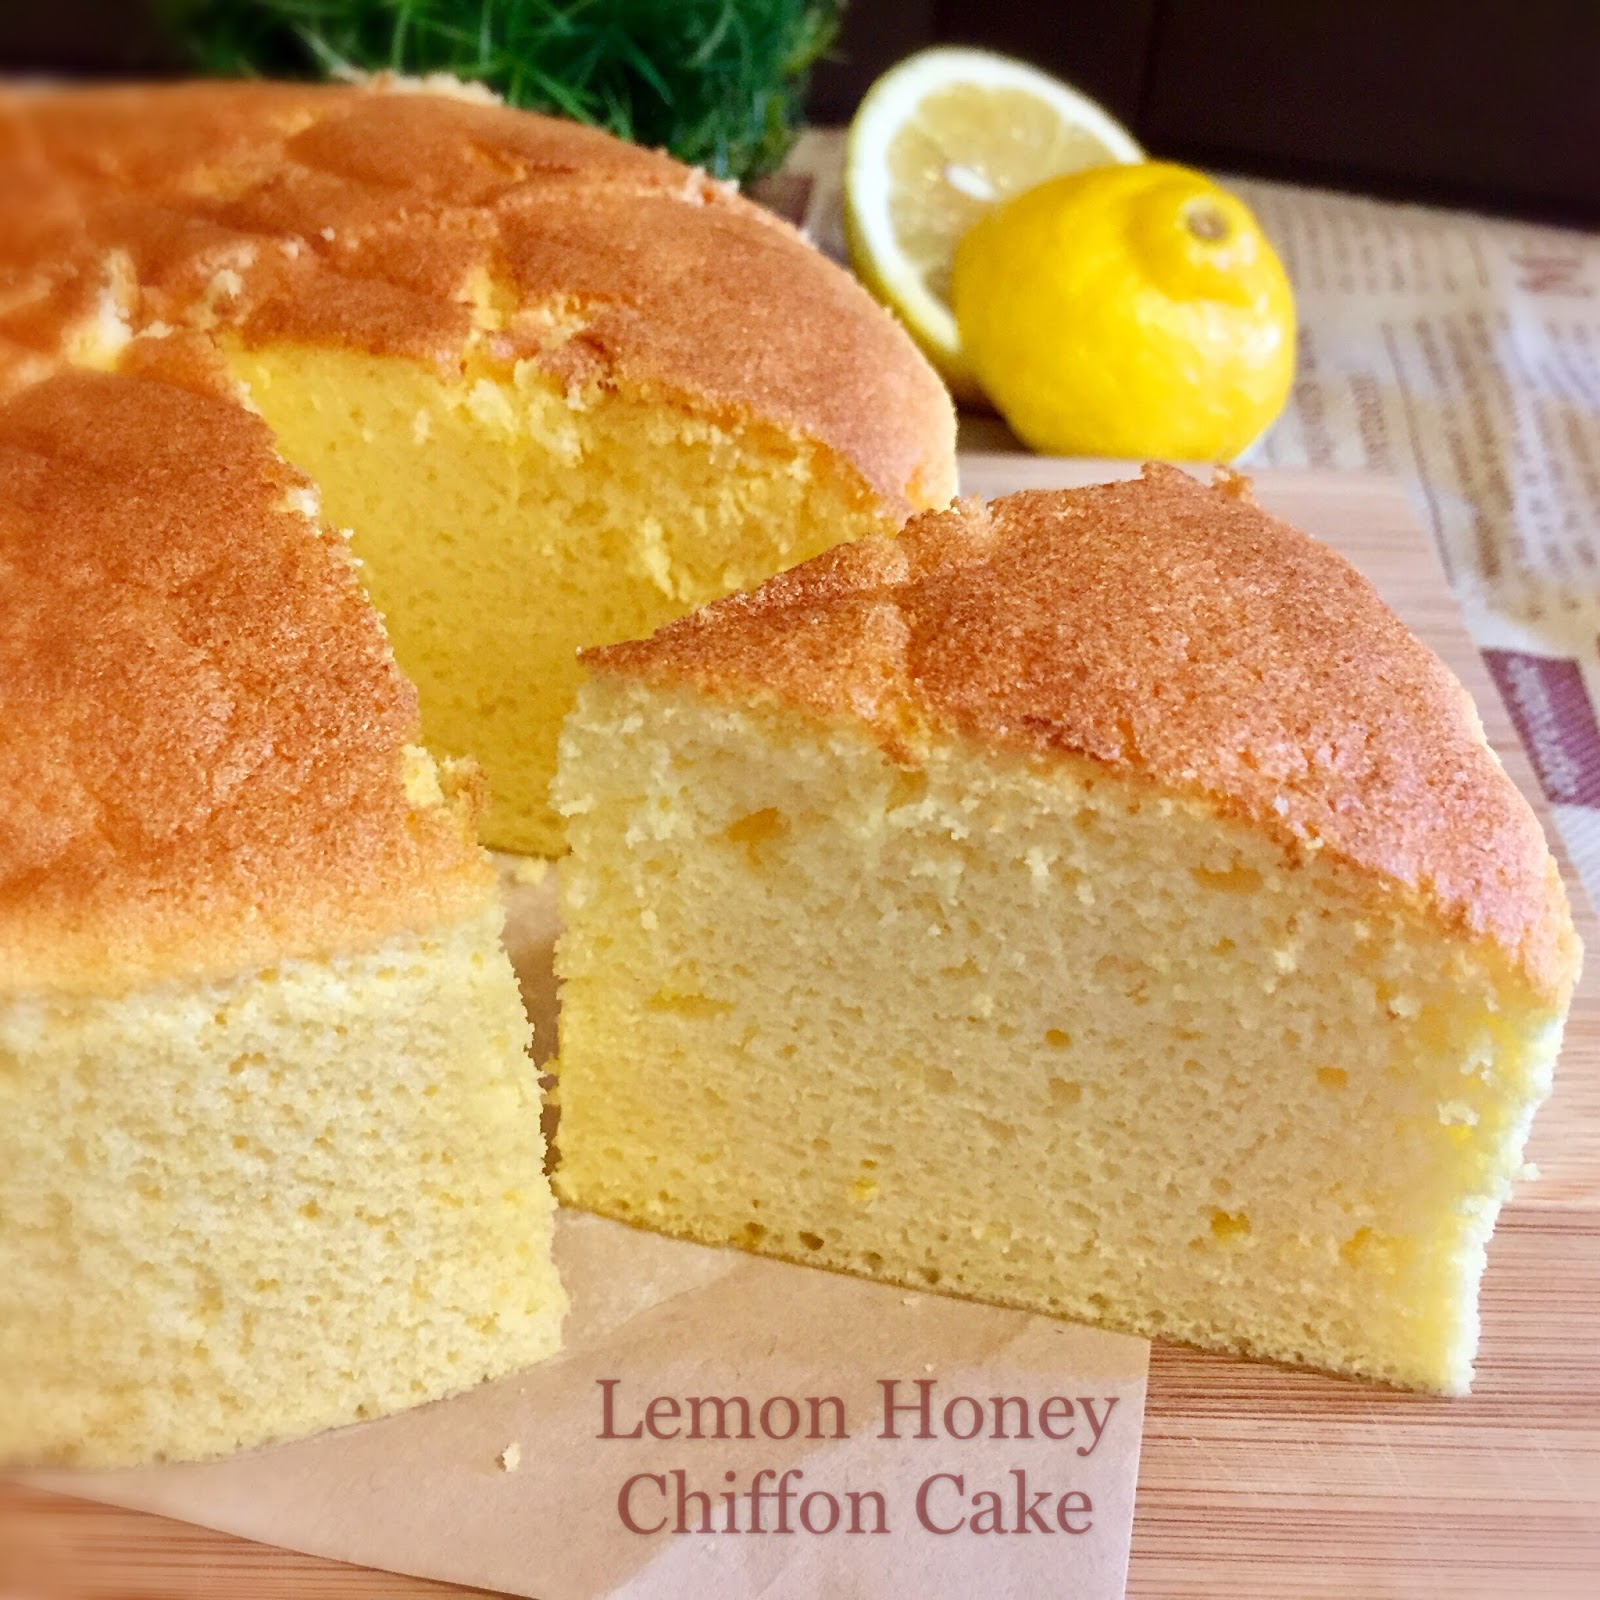 My Mind Patch Lemon Honey Chiffon Cake 柠檬蜂蜜威风蛋糕